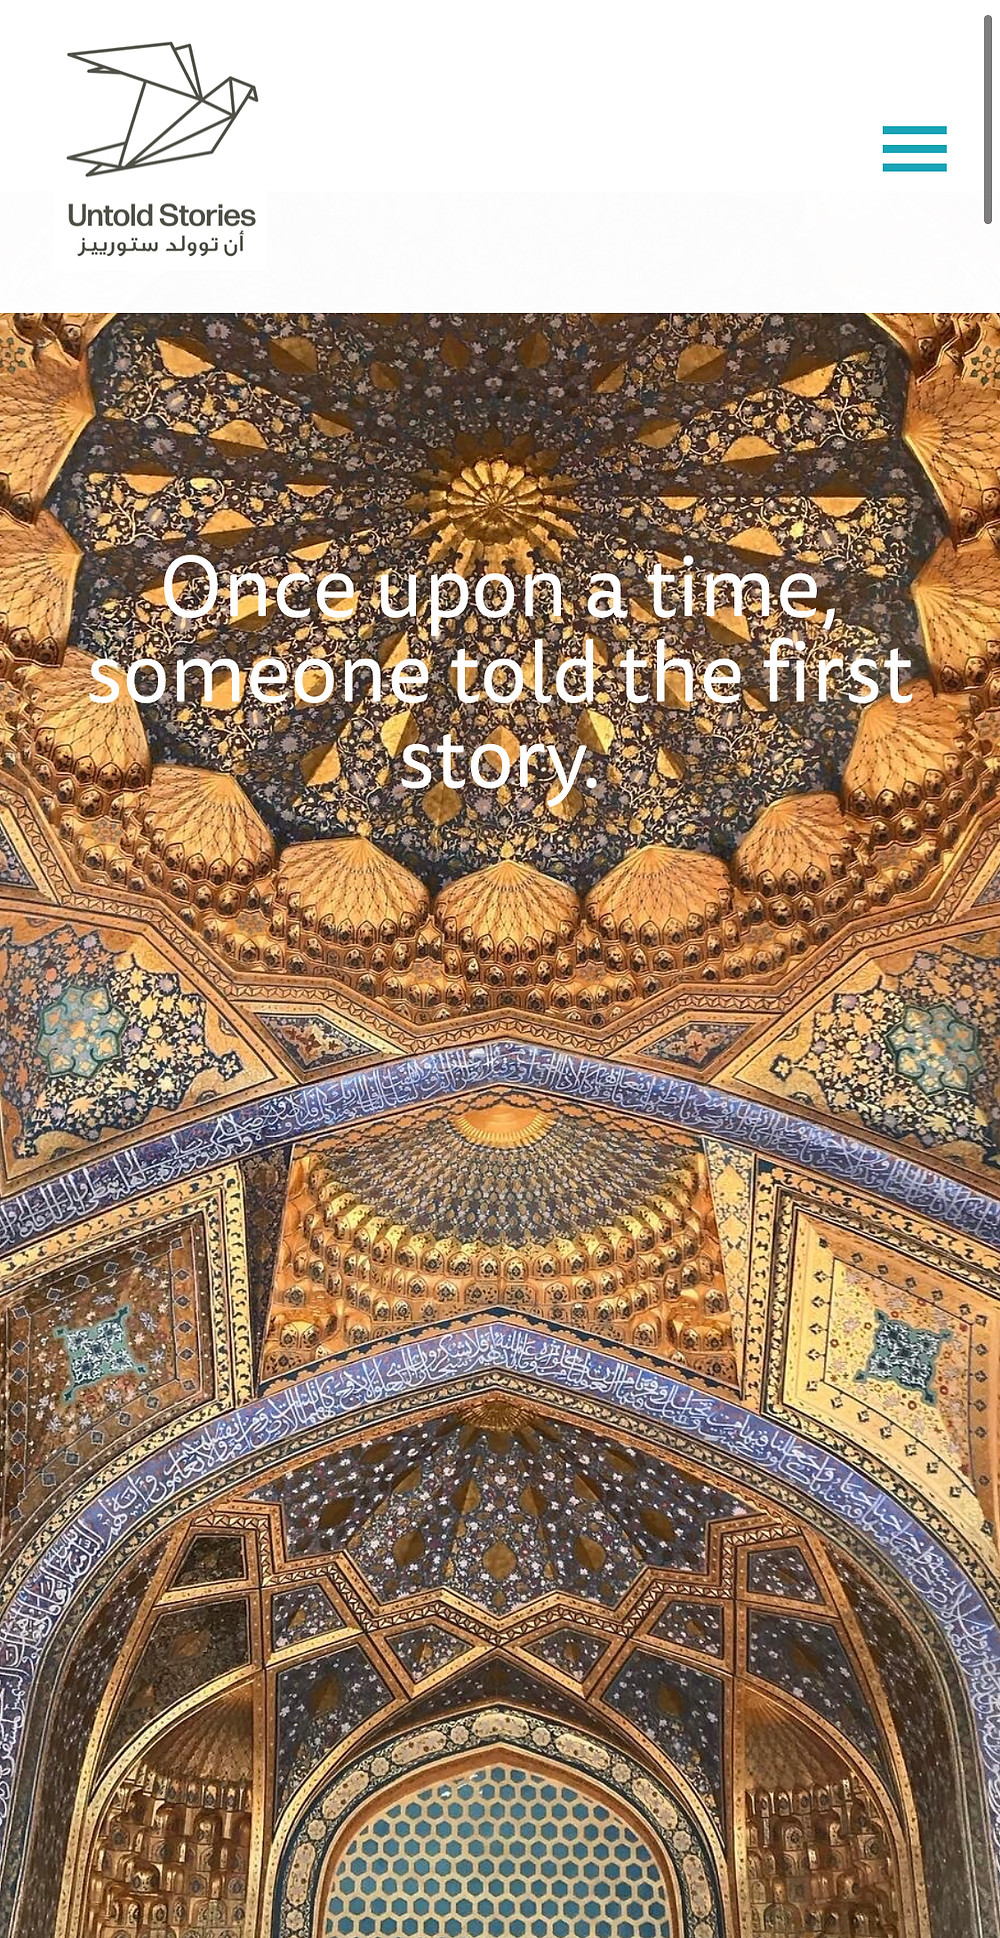 Homepage of Untold Stories LLC